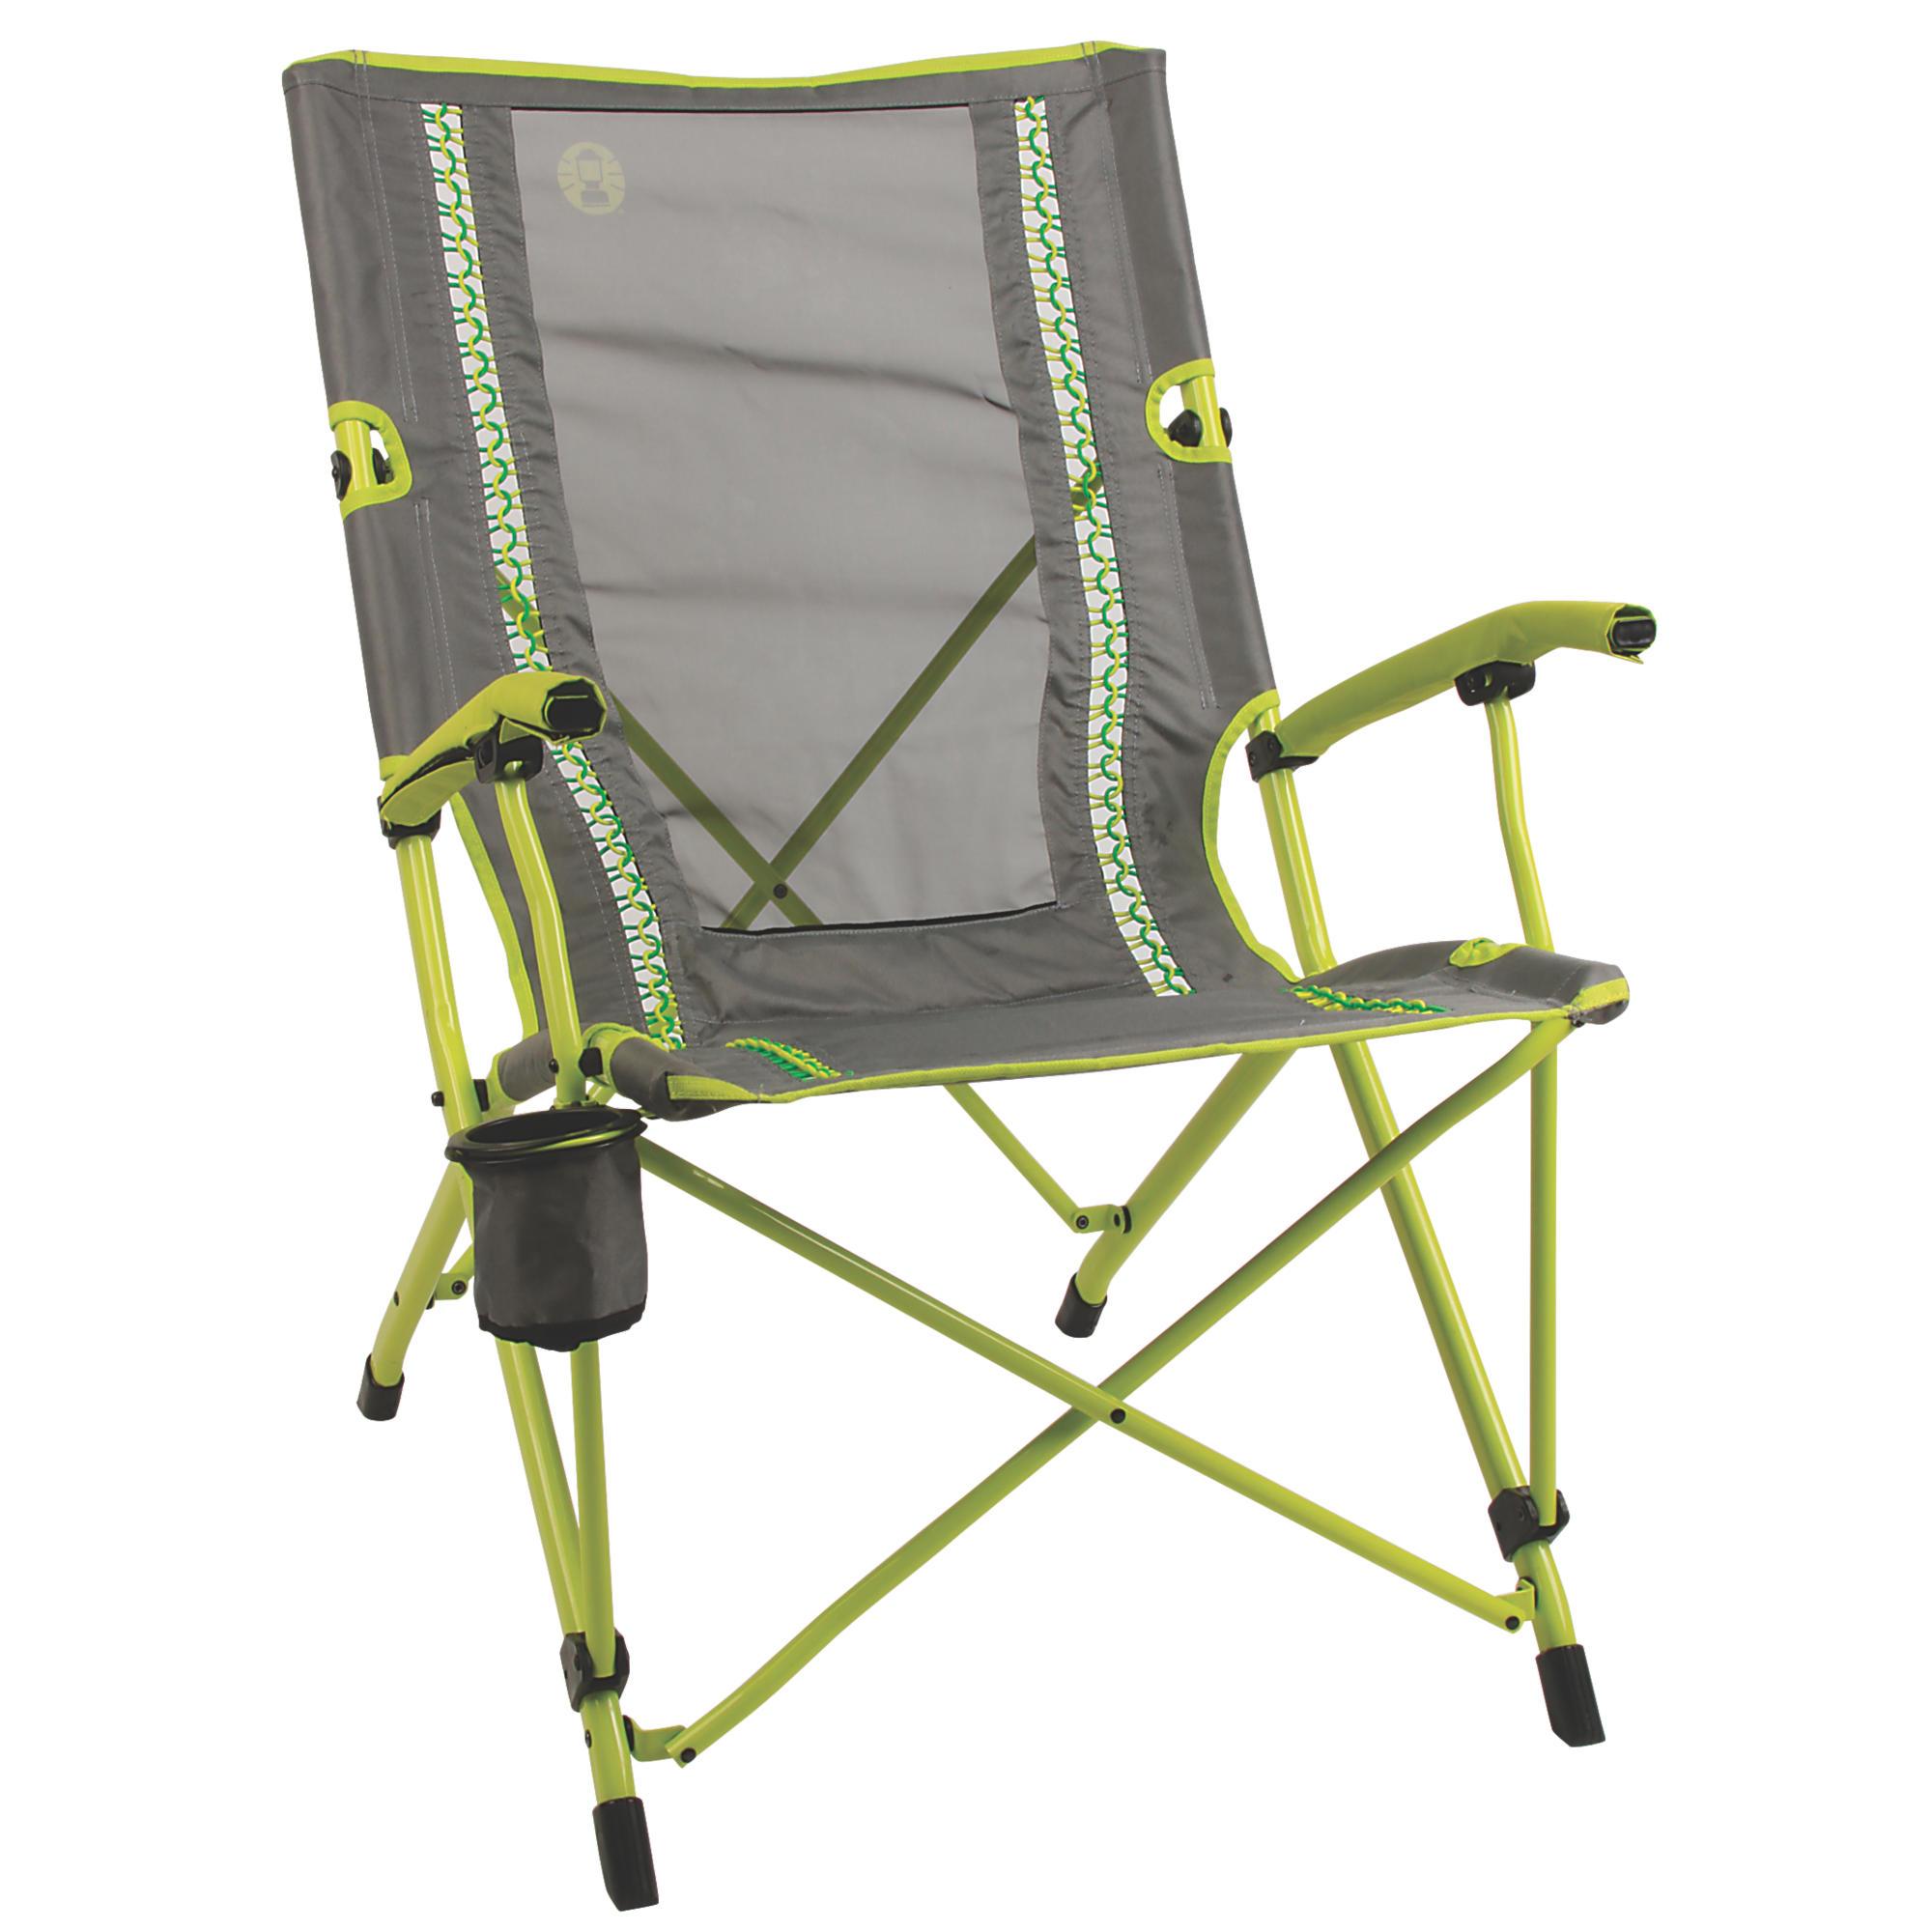 Interlock Breeze Suspension Chair